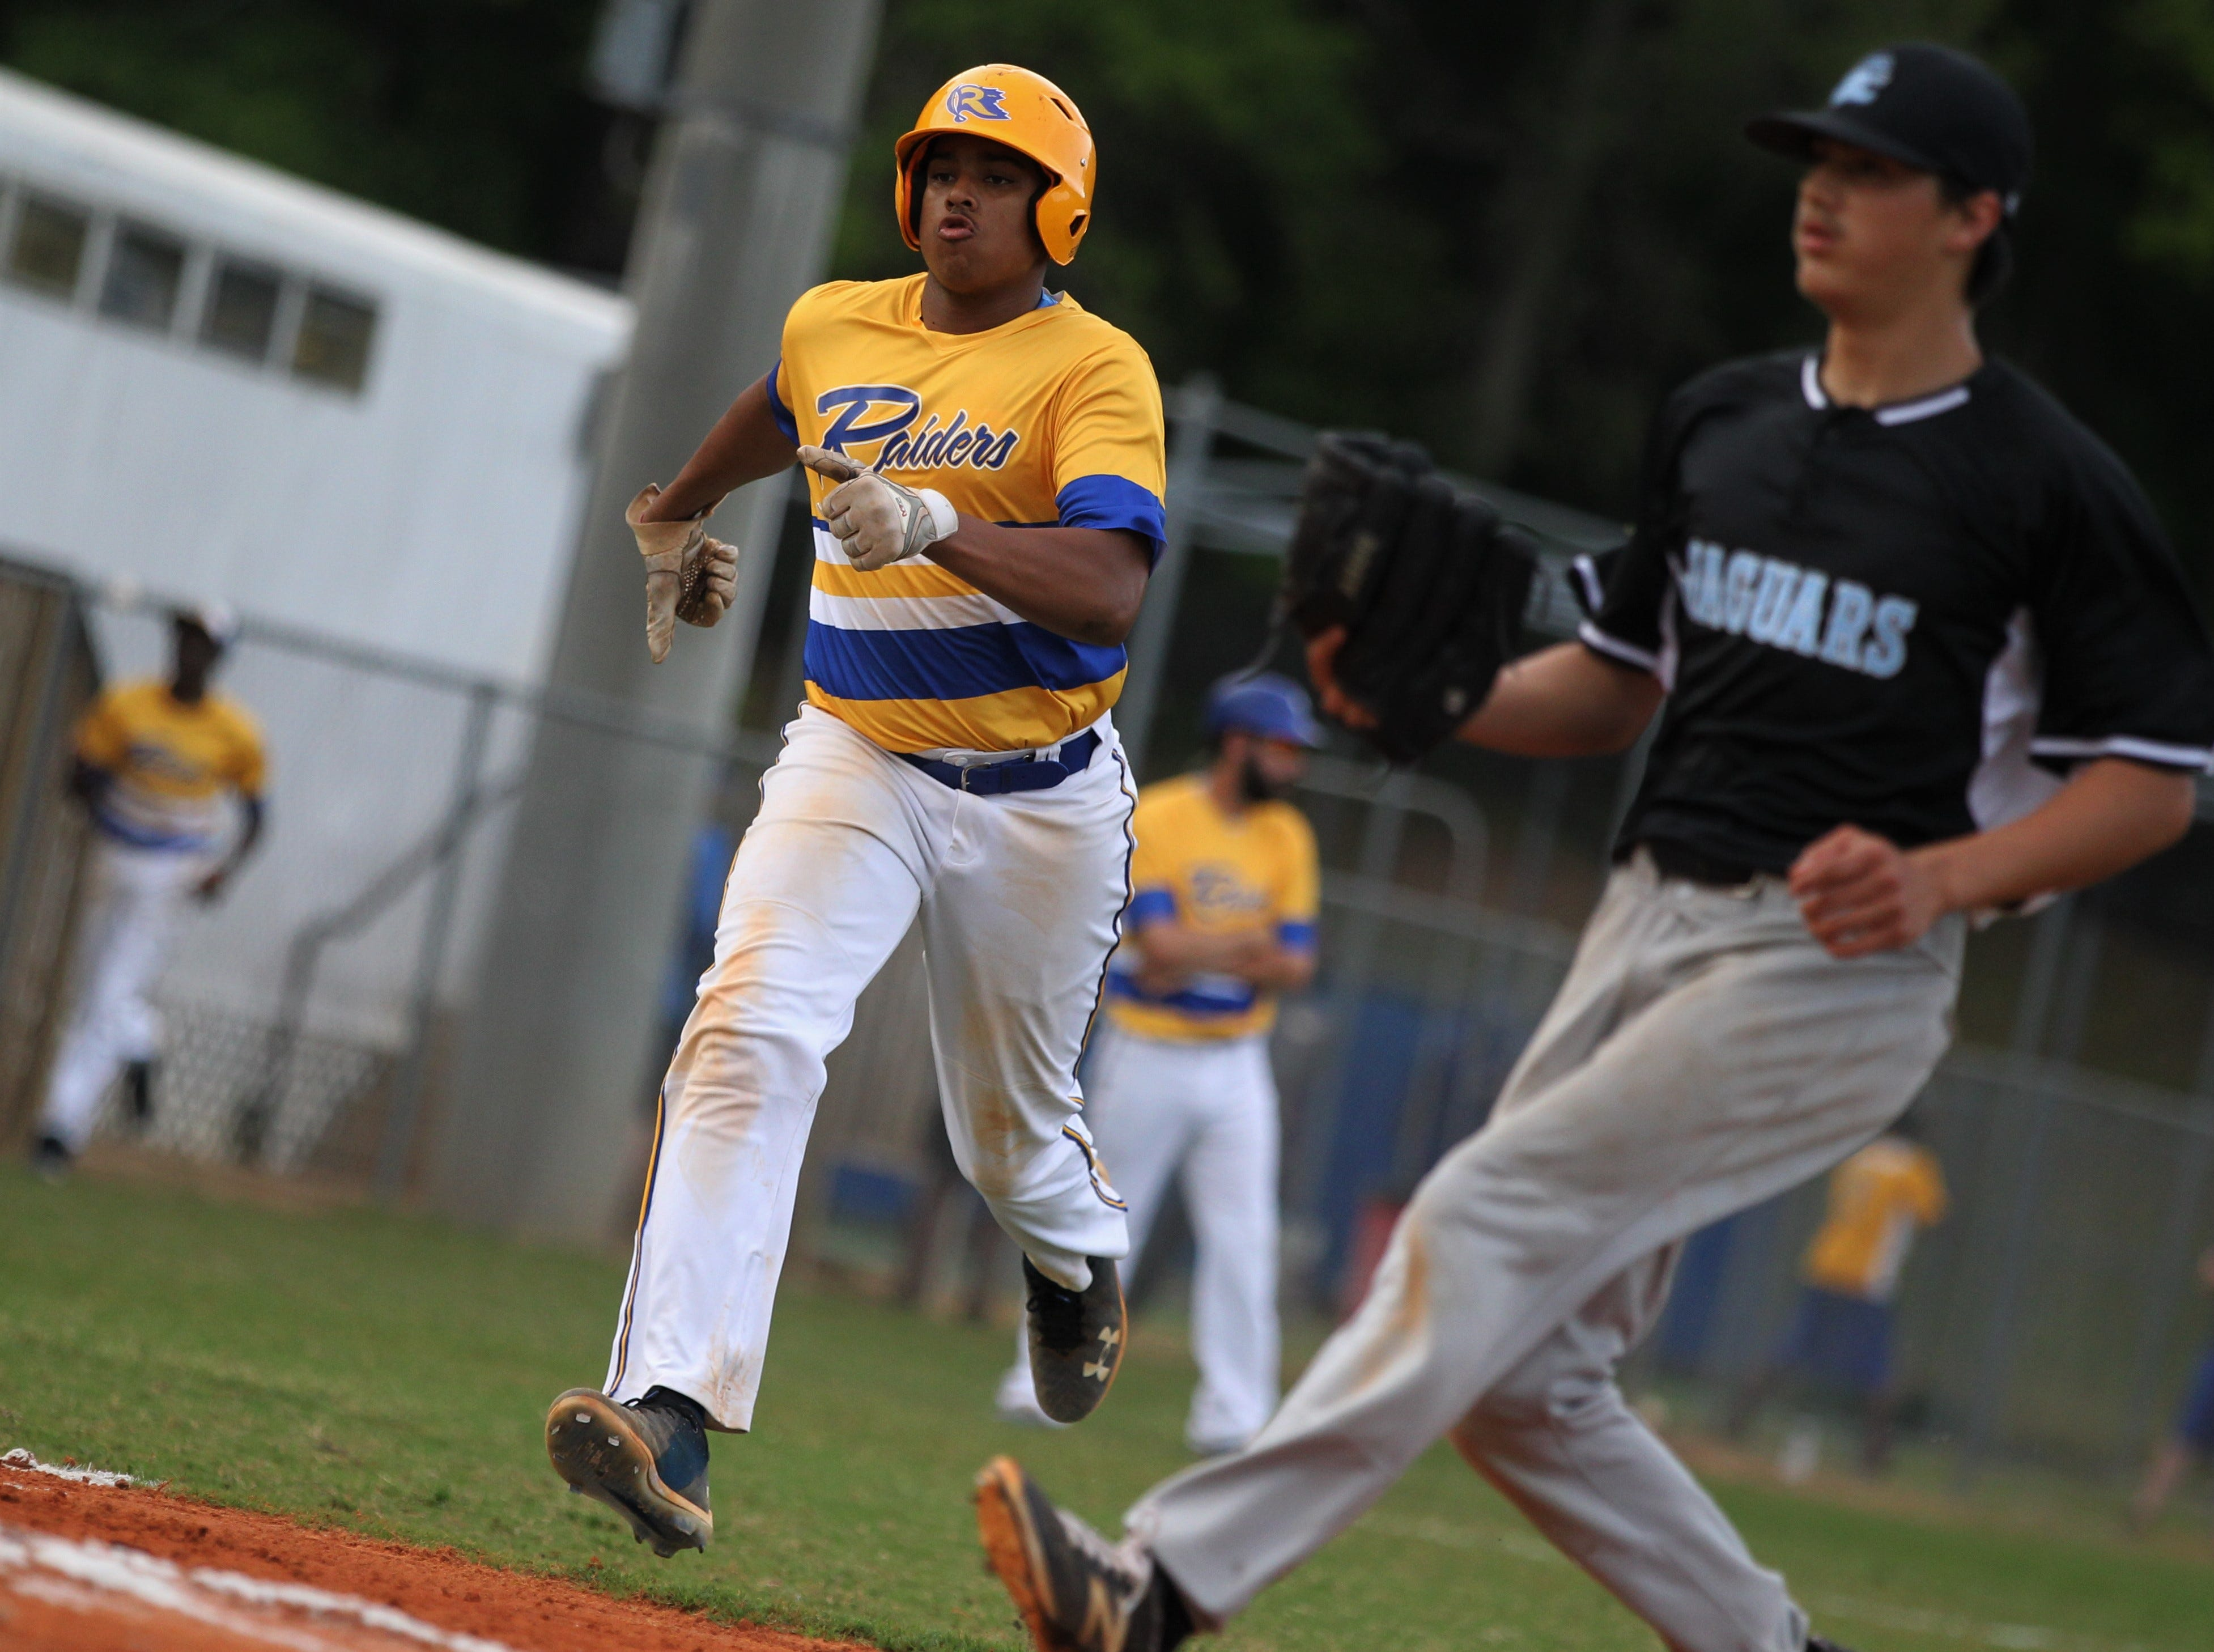 Rickards senior Norris Leland scores a run as Rickards beat Gadsden County 18-0 in three innings on Friday, April 12, 2019.